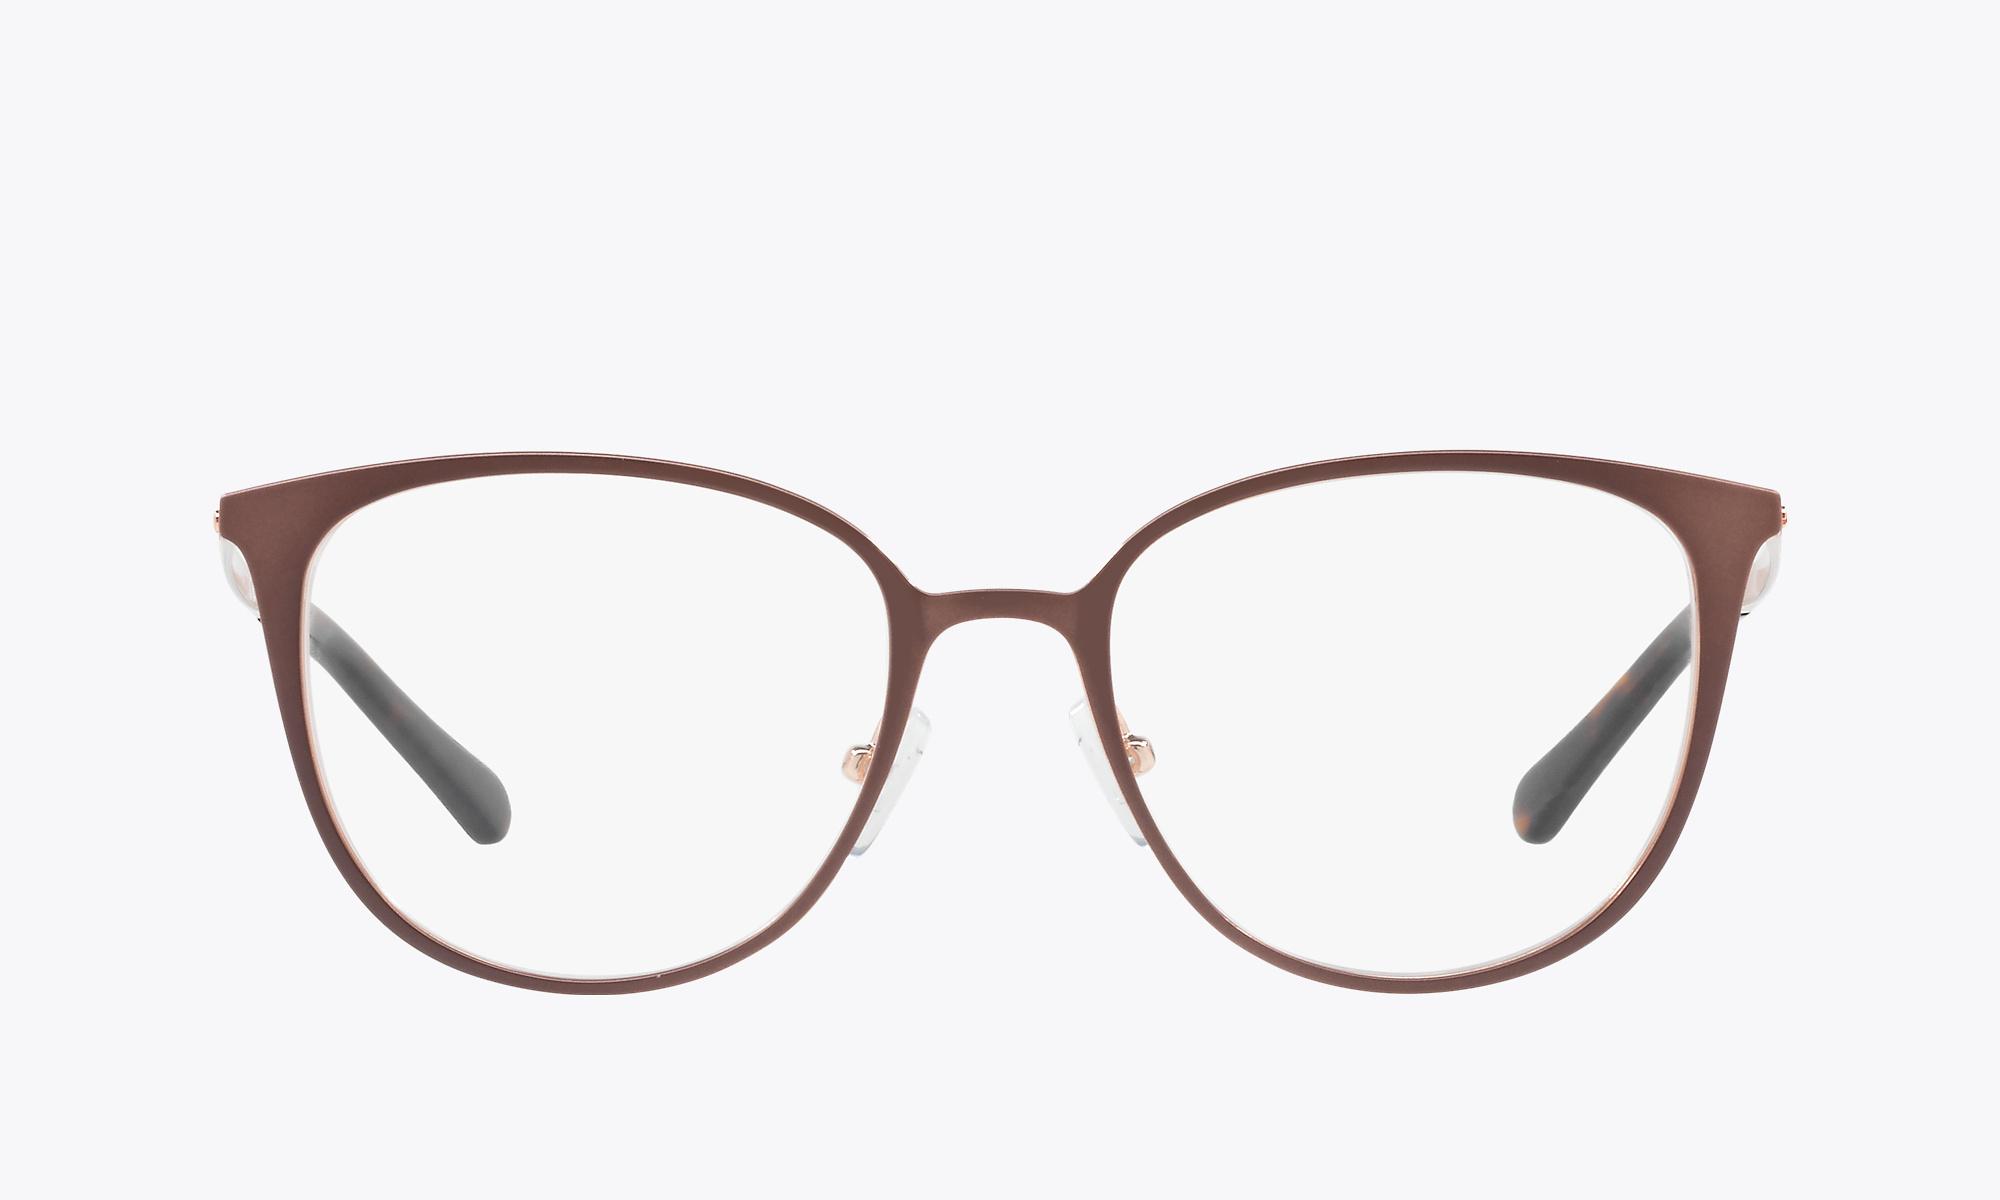 Image of Michael Kors LIL color Brown